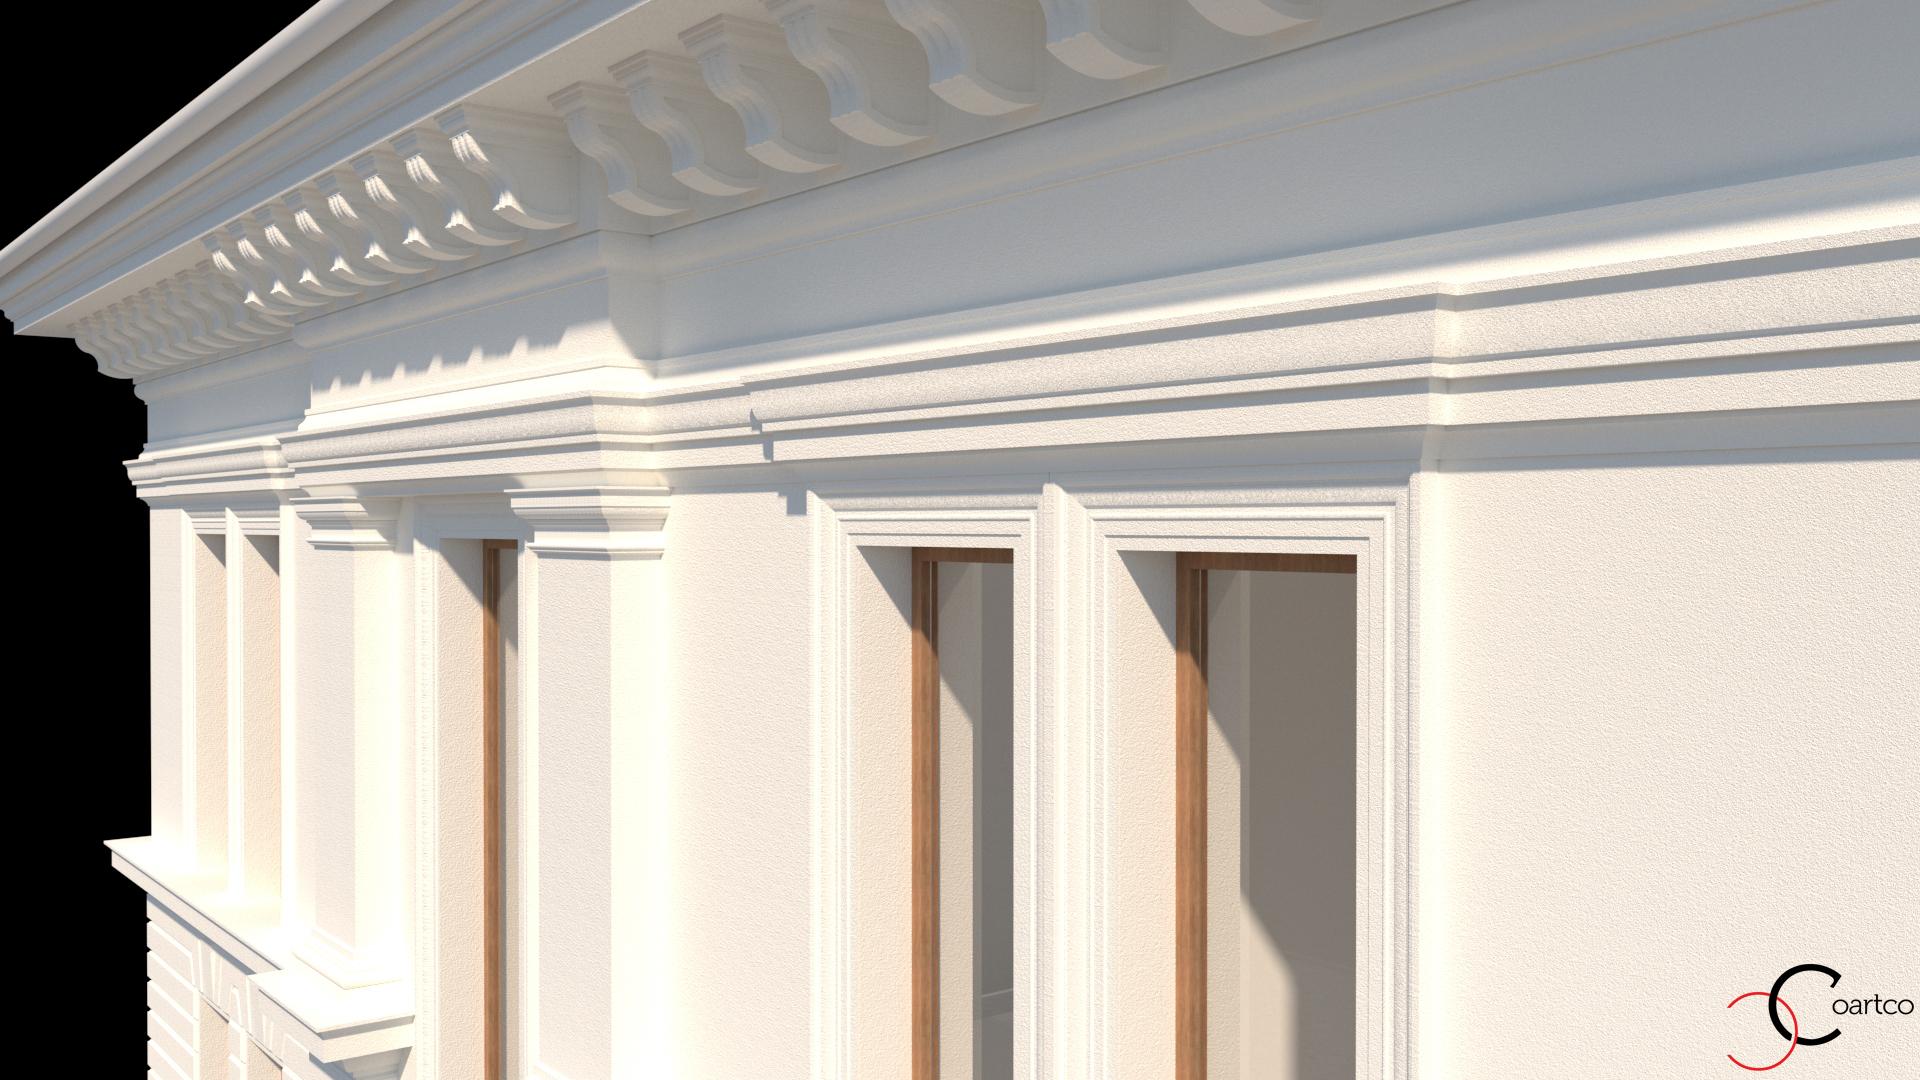 proiect-firma-arhitectura-fatada-casa-cu-cornisa-decorativa